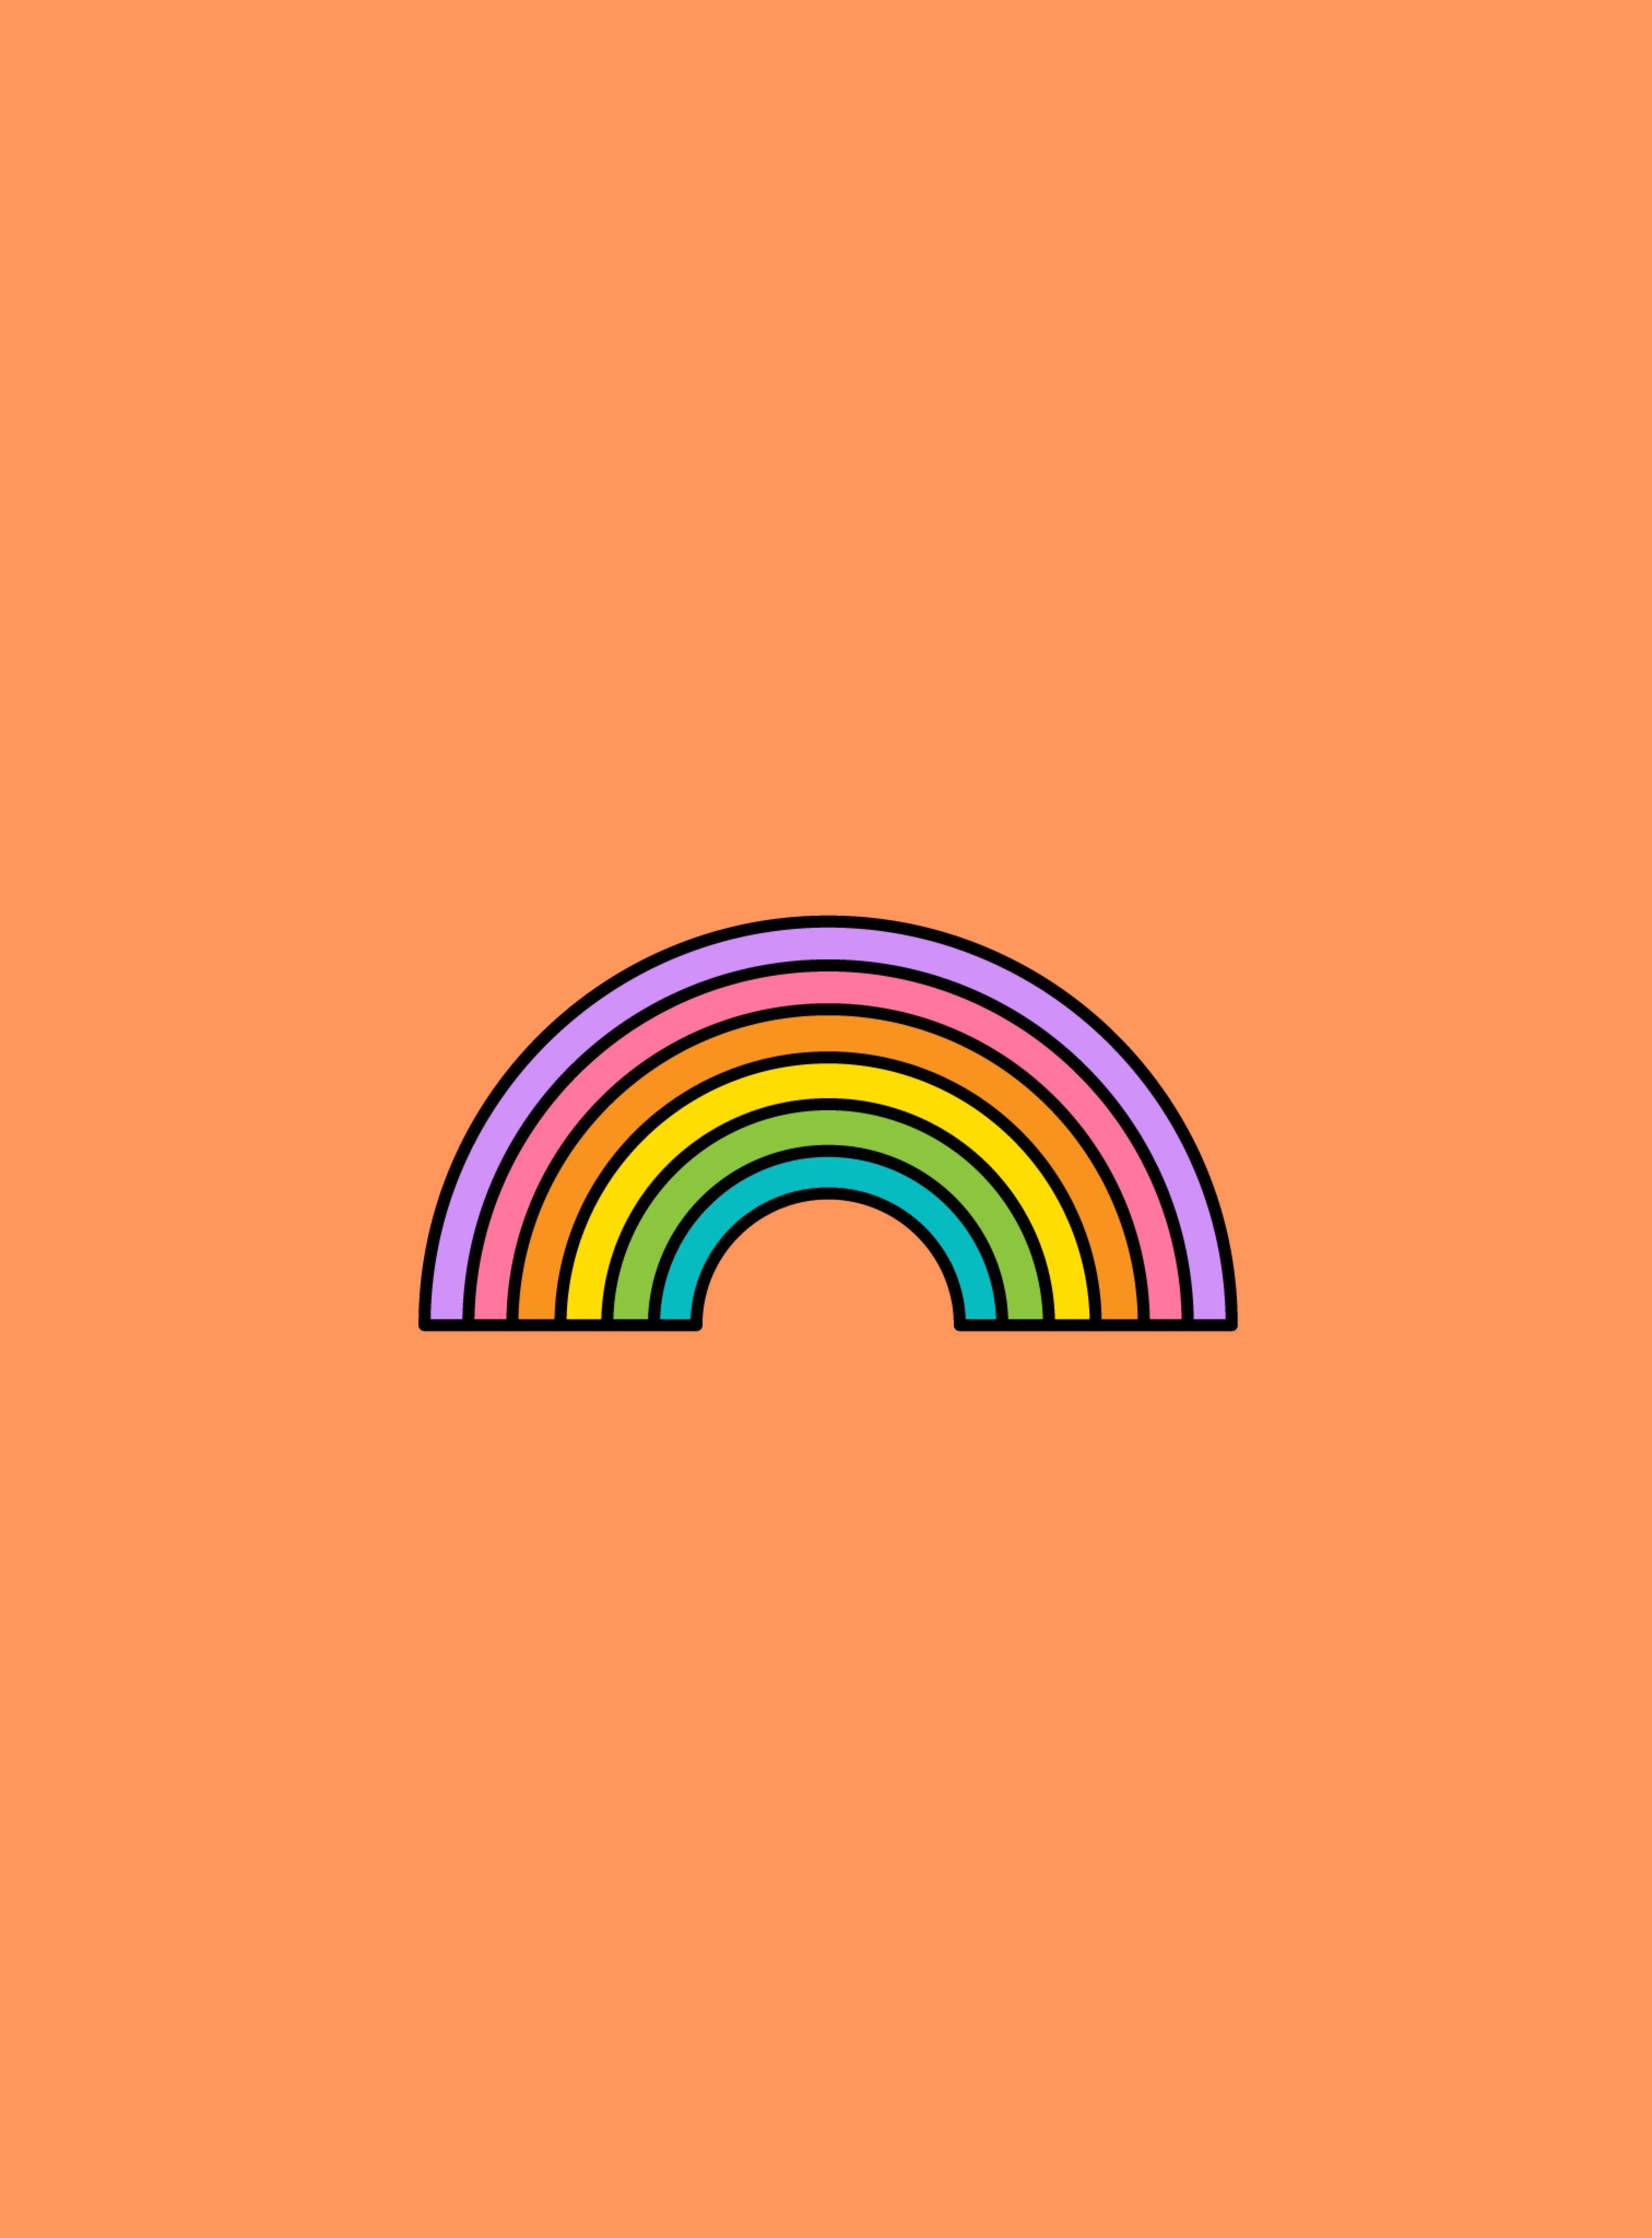 Cute Rainbow Wallpaper Rainbow Wallpaper Rainbow Wallpaper Iphone Ipod Wallpaper